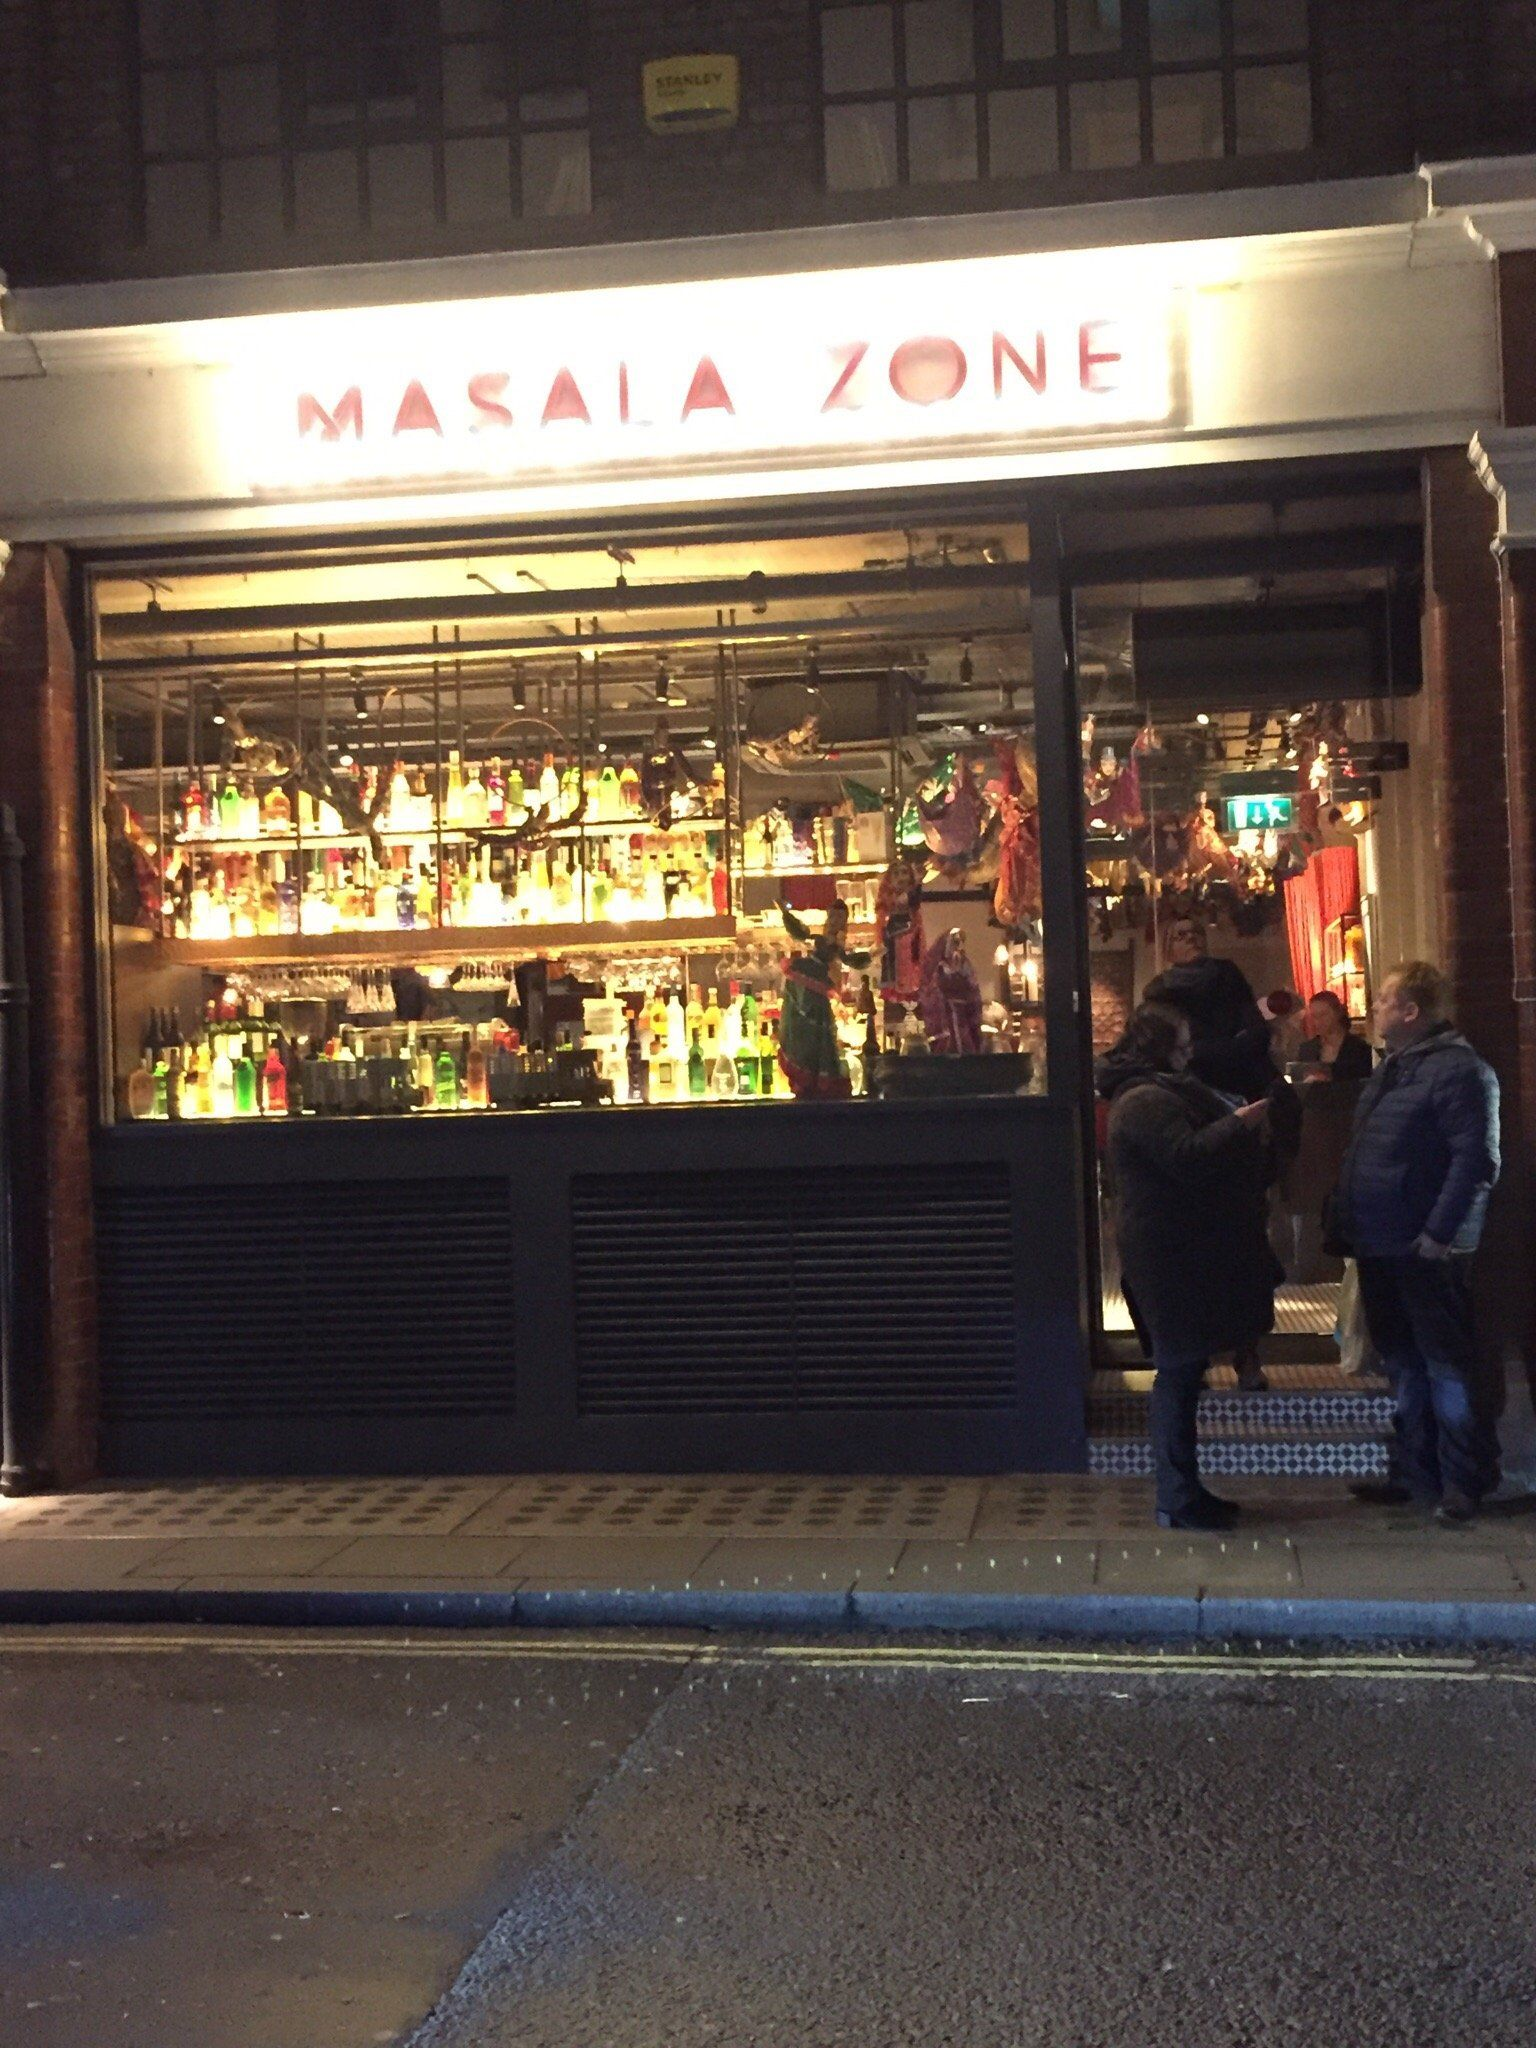 Masala Zone Covent Garden, London Covent Garden